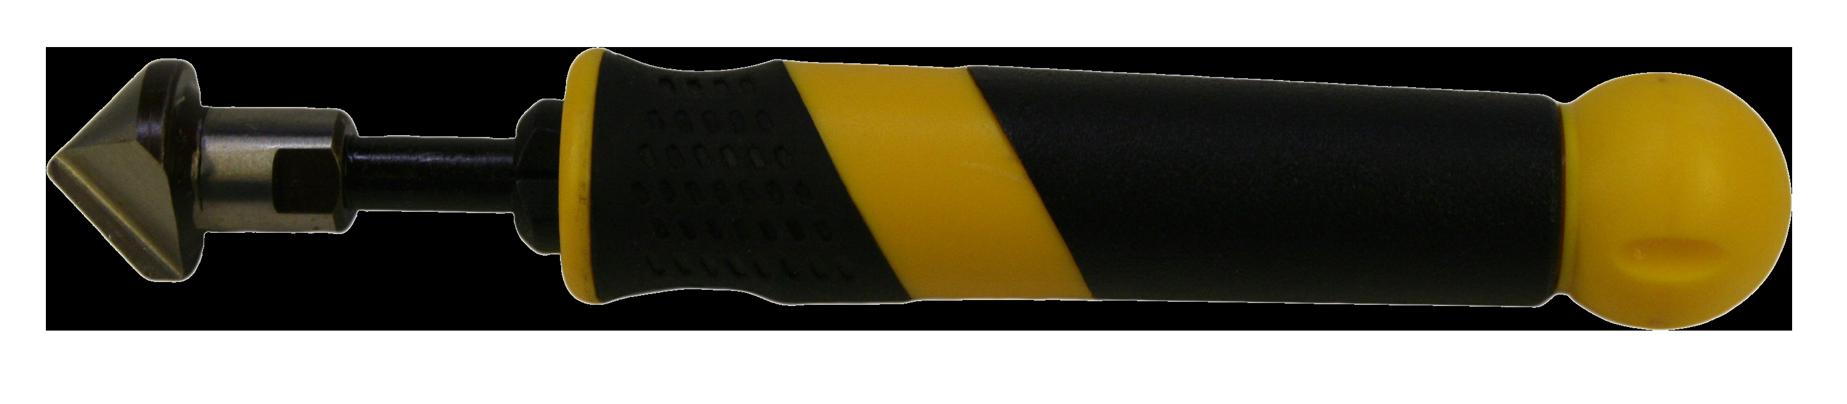 Set Maxi MK F F20, Ø 1 - 20 mm Image